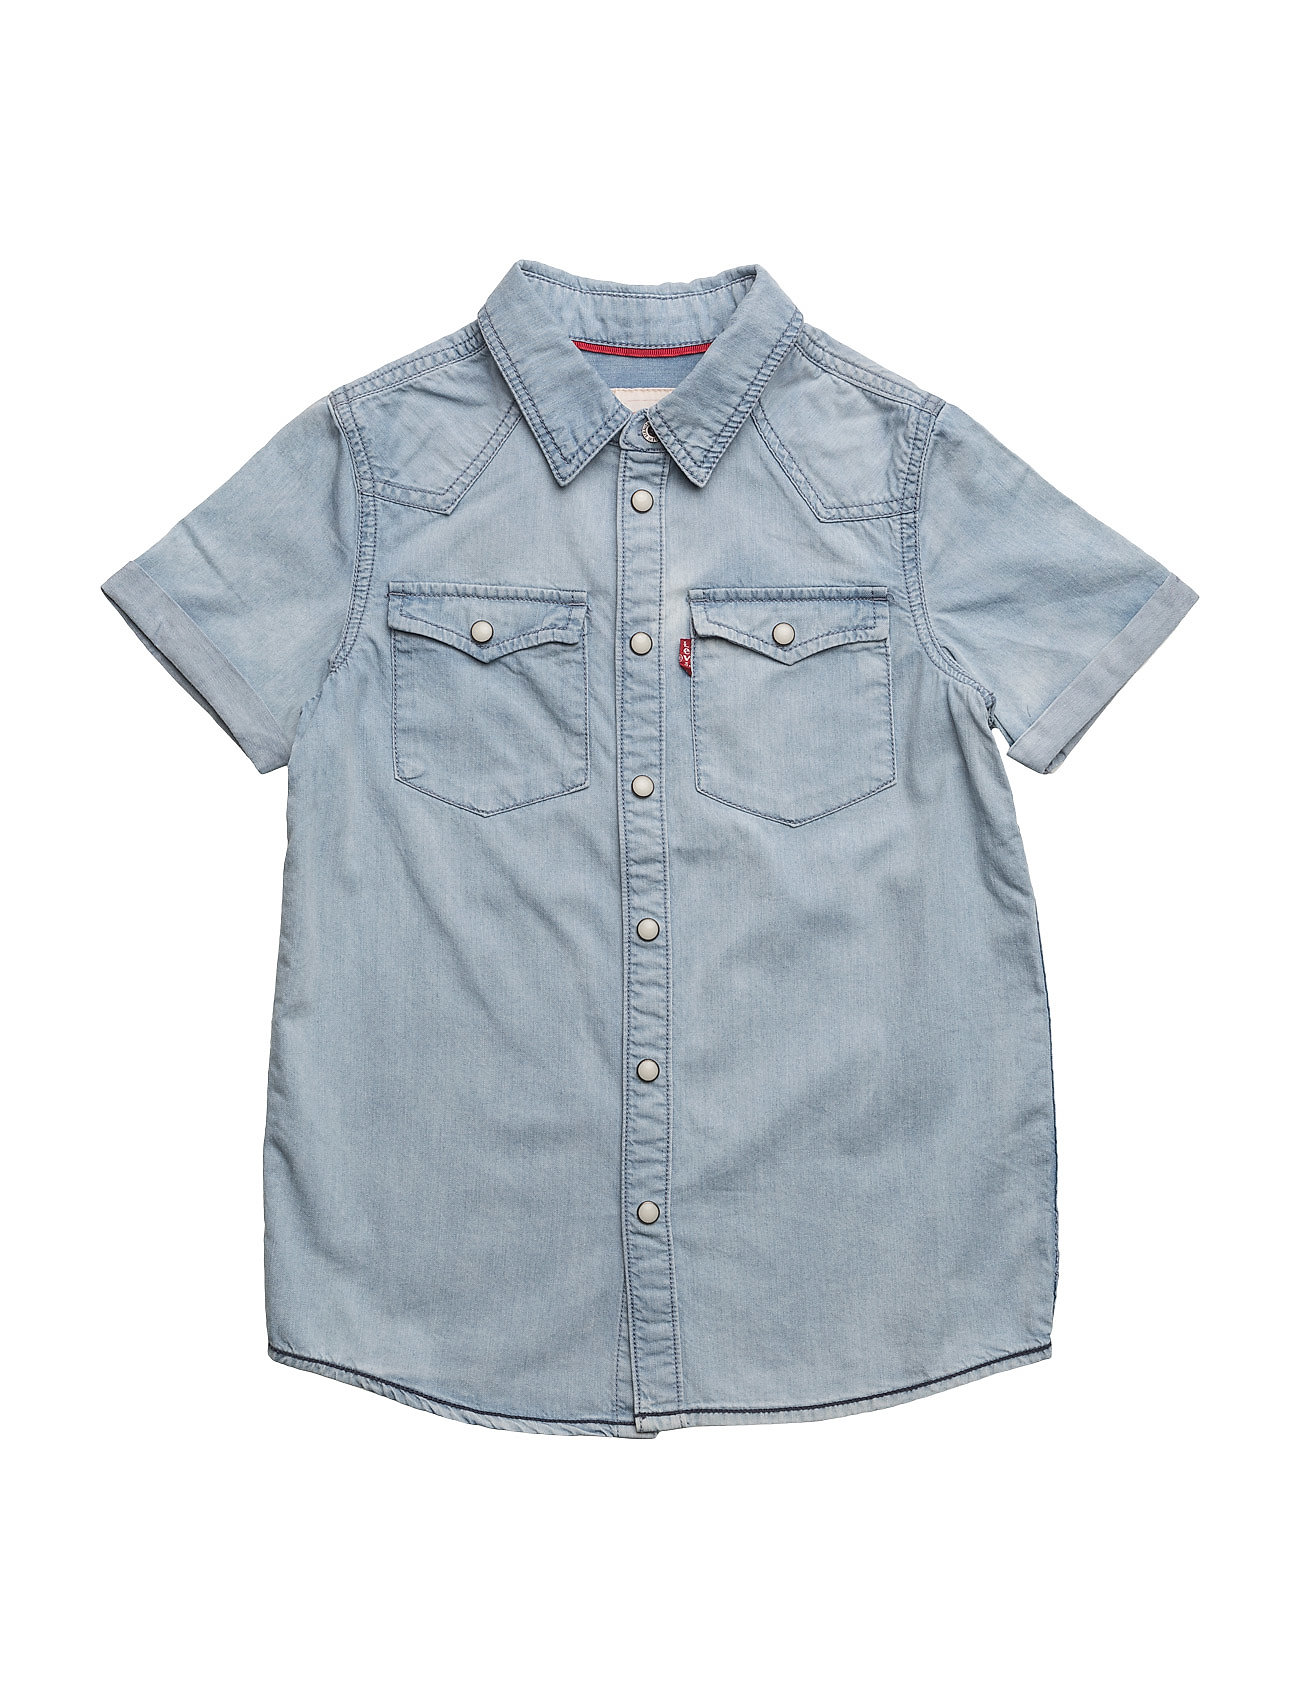 Ss Shirt Bobby Levi's Kids  til Børn i indigo